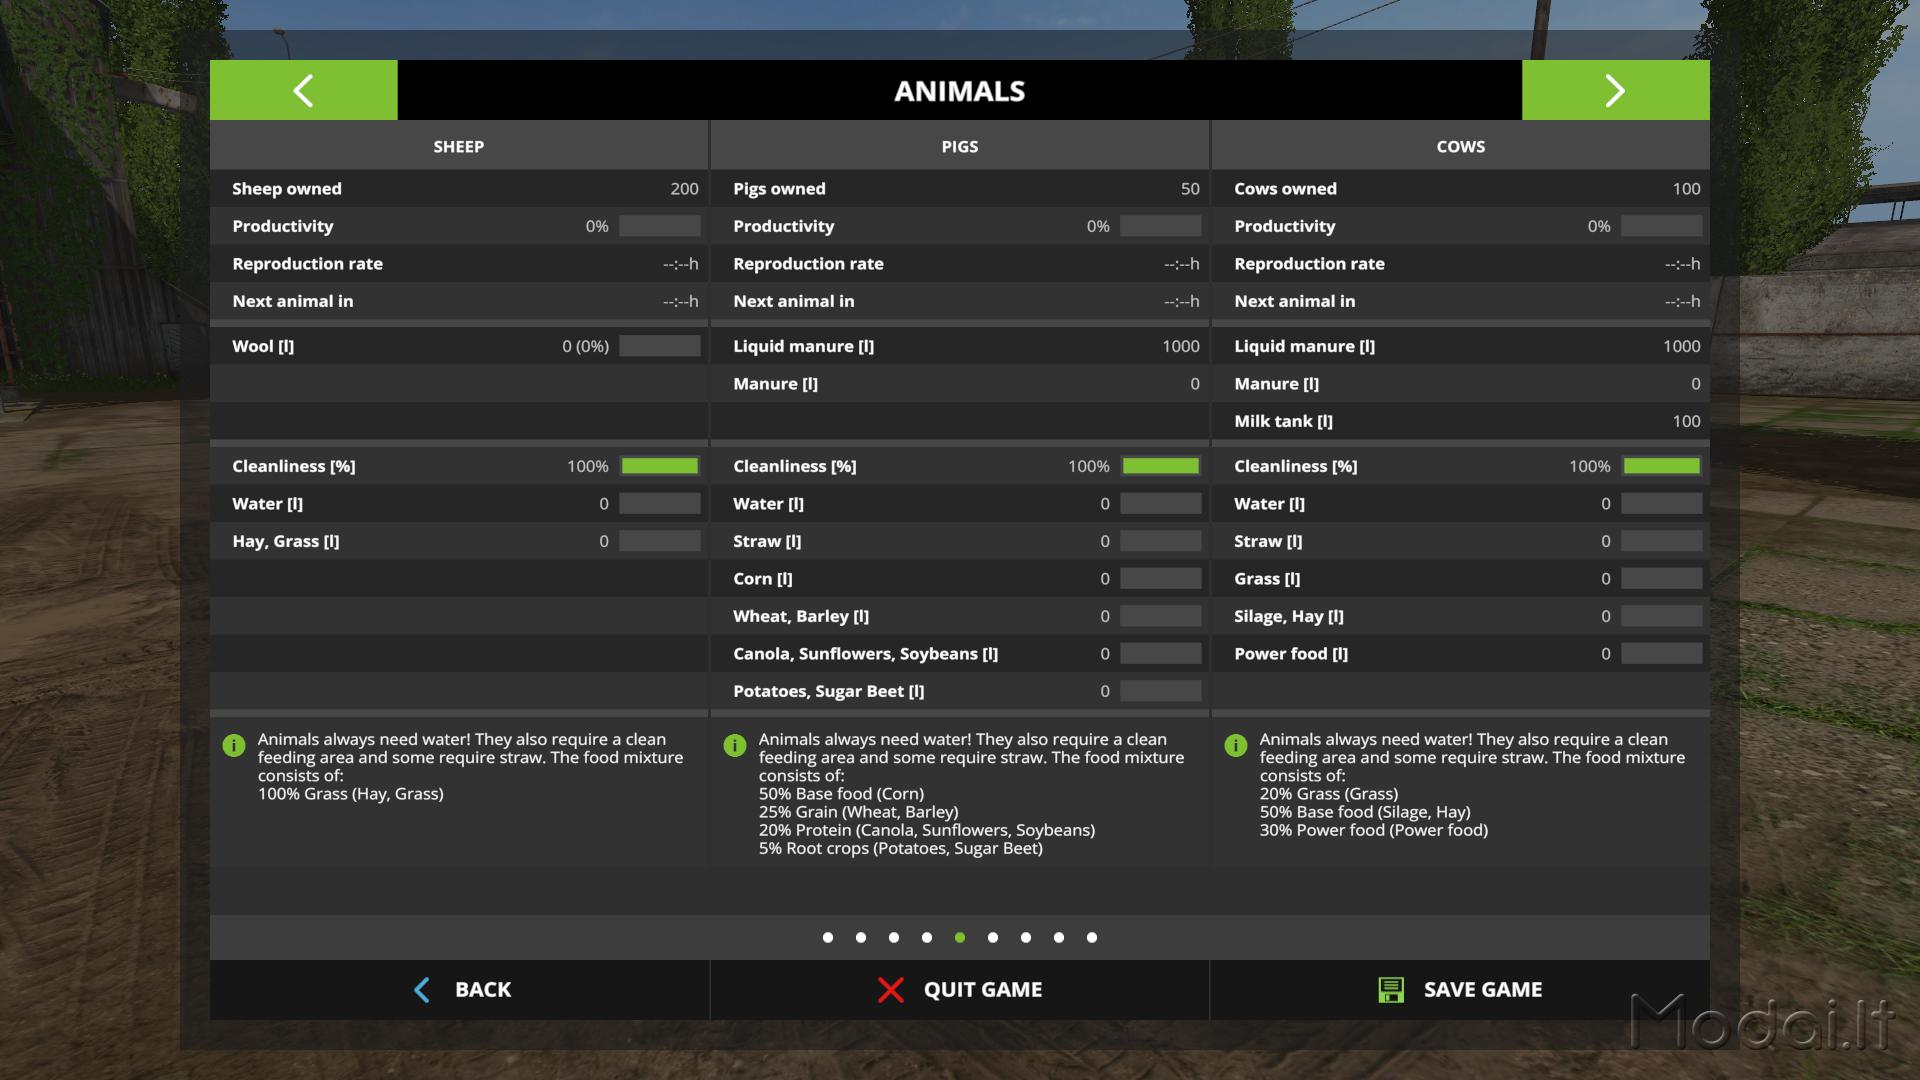 Euro truck simulator 2 save game editor